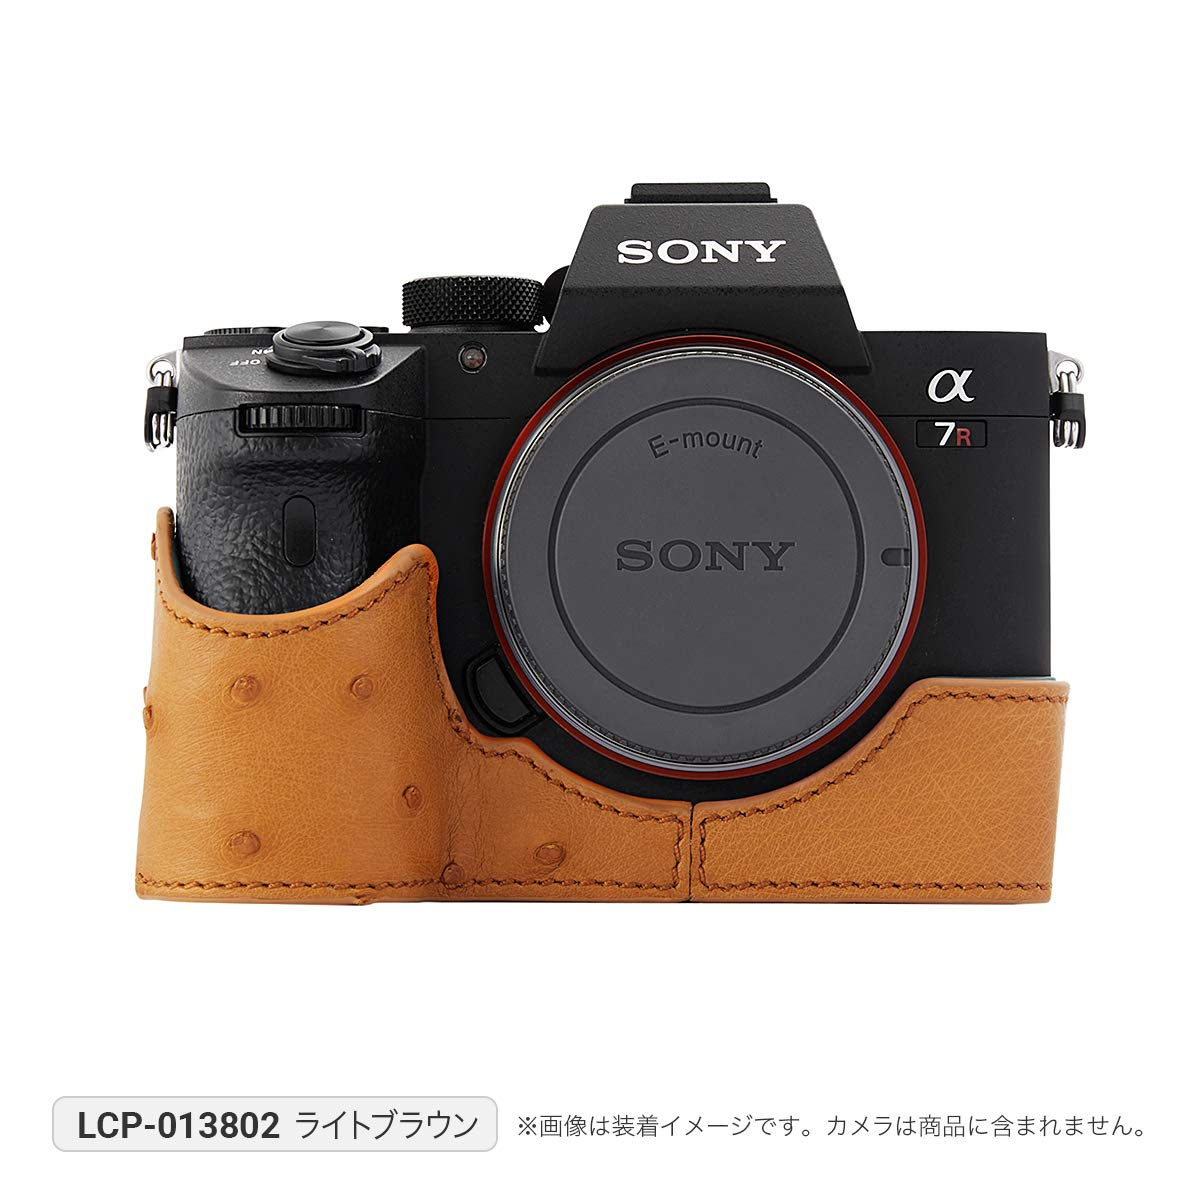 cam-in (カムイン) カメラケース ソニー SONY α9α7R IIIα7 III用 オストリッチレザー LCP-013 (ライトブラウン) LCP-013 オーストリッチレザー ライトブラウン B07HP7J14B